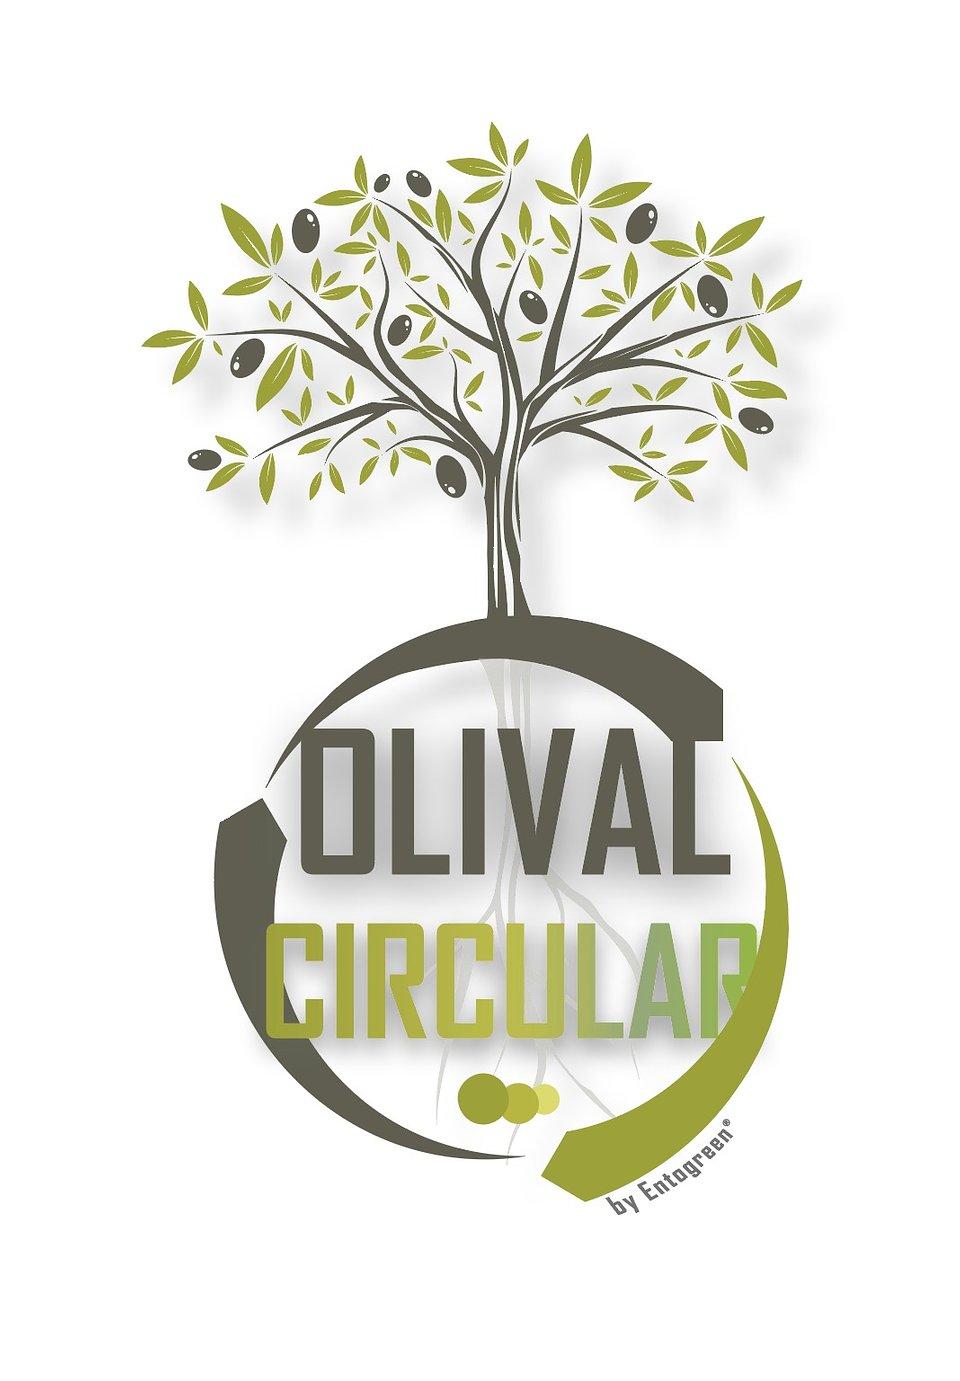 Olival circular.jpeg